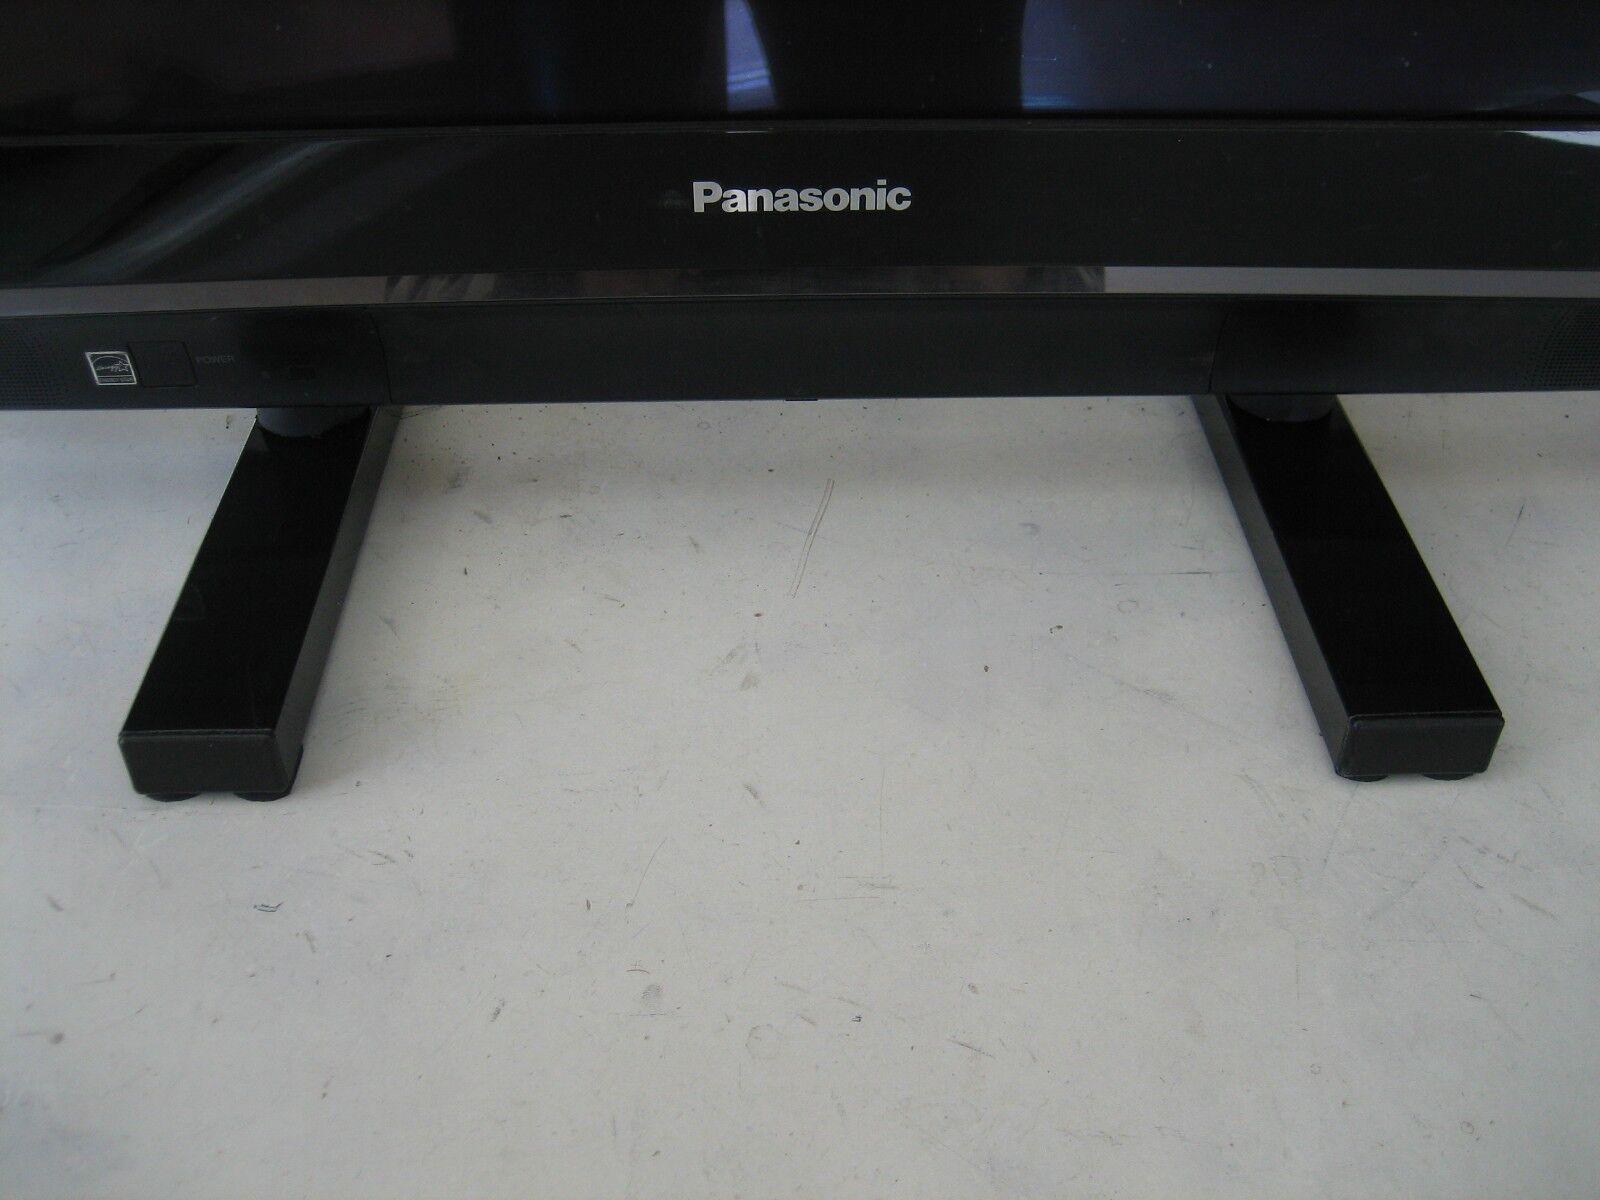 #1  COMPATIBLE PANASONIC TV BASE PEDESTAL STAND TH-37PX60U T